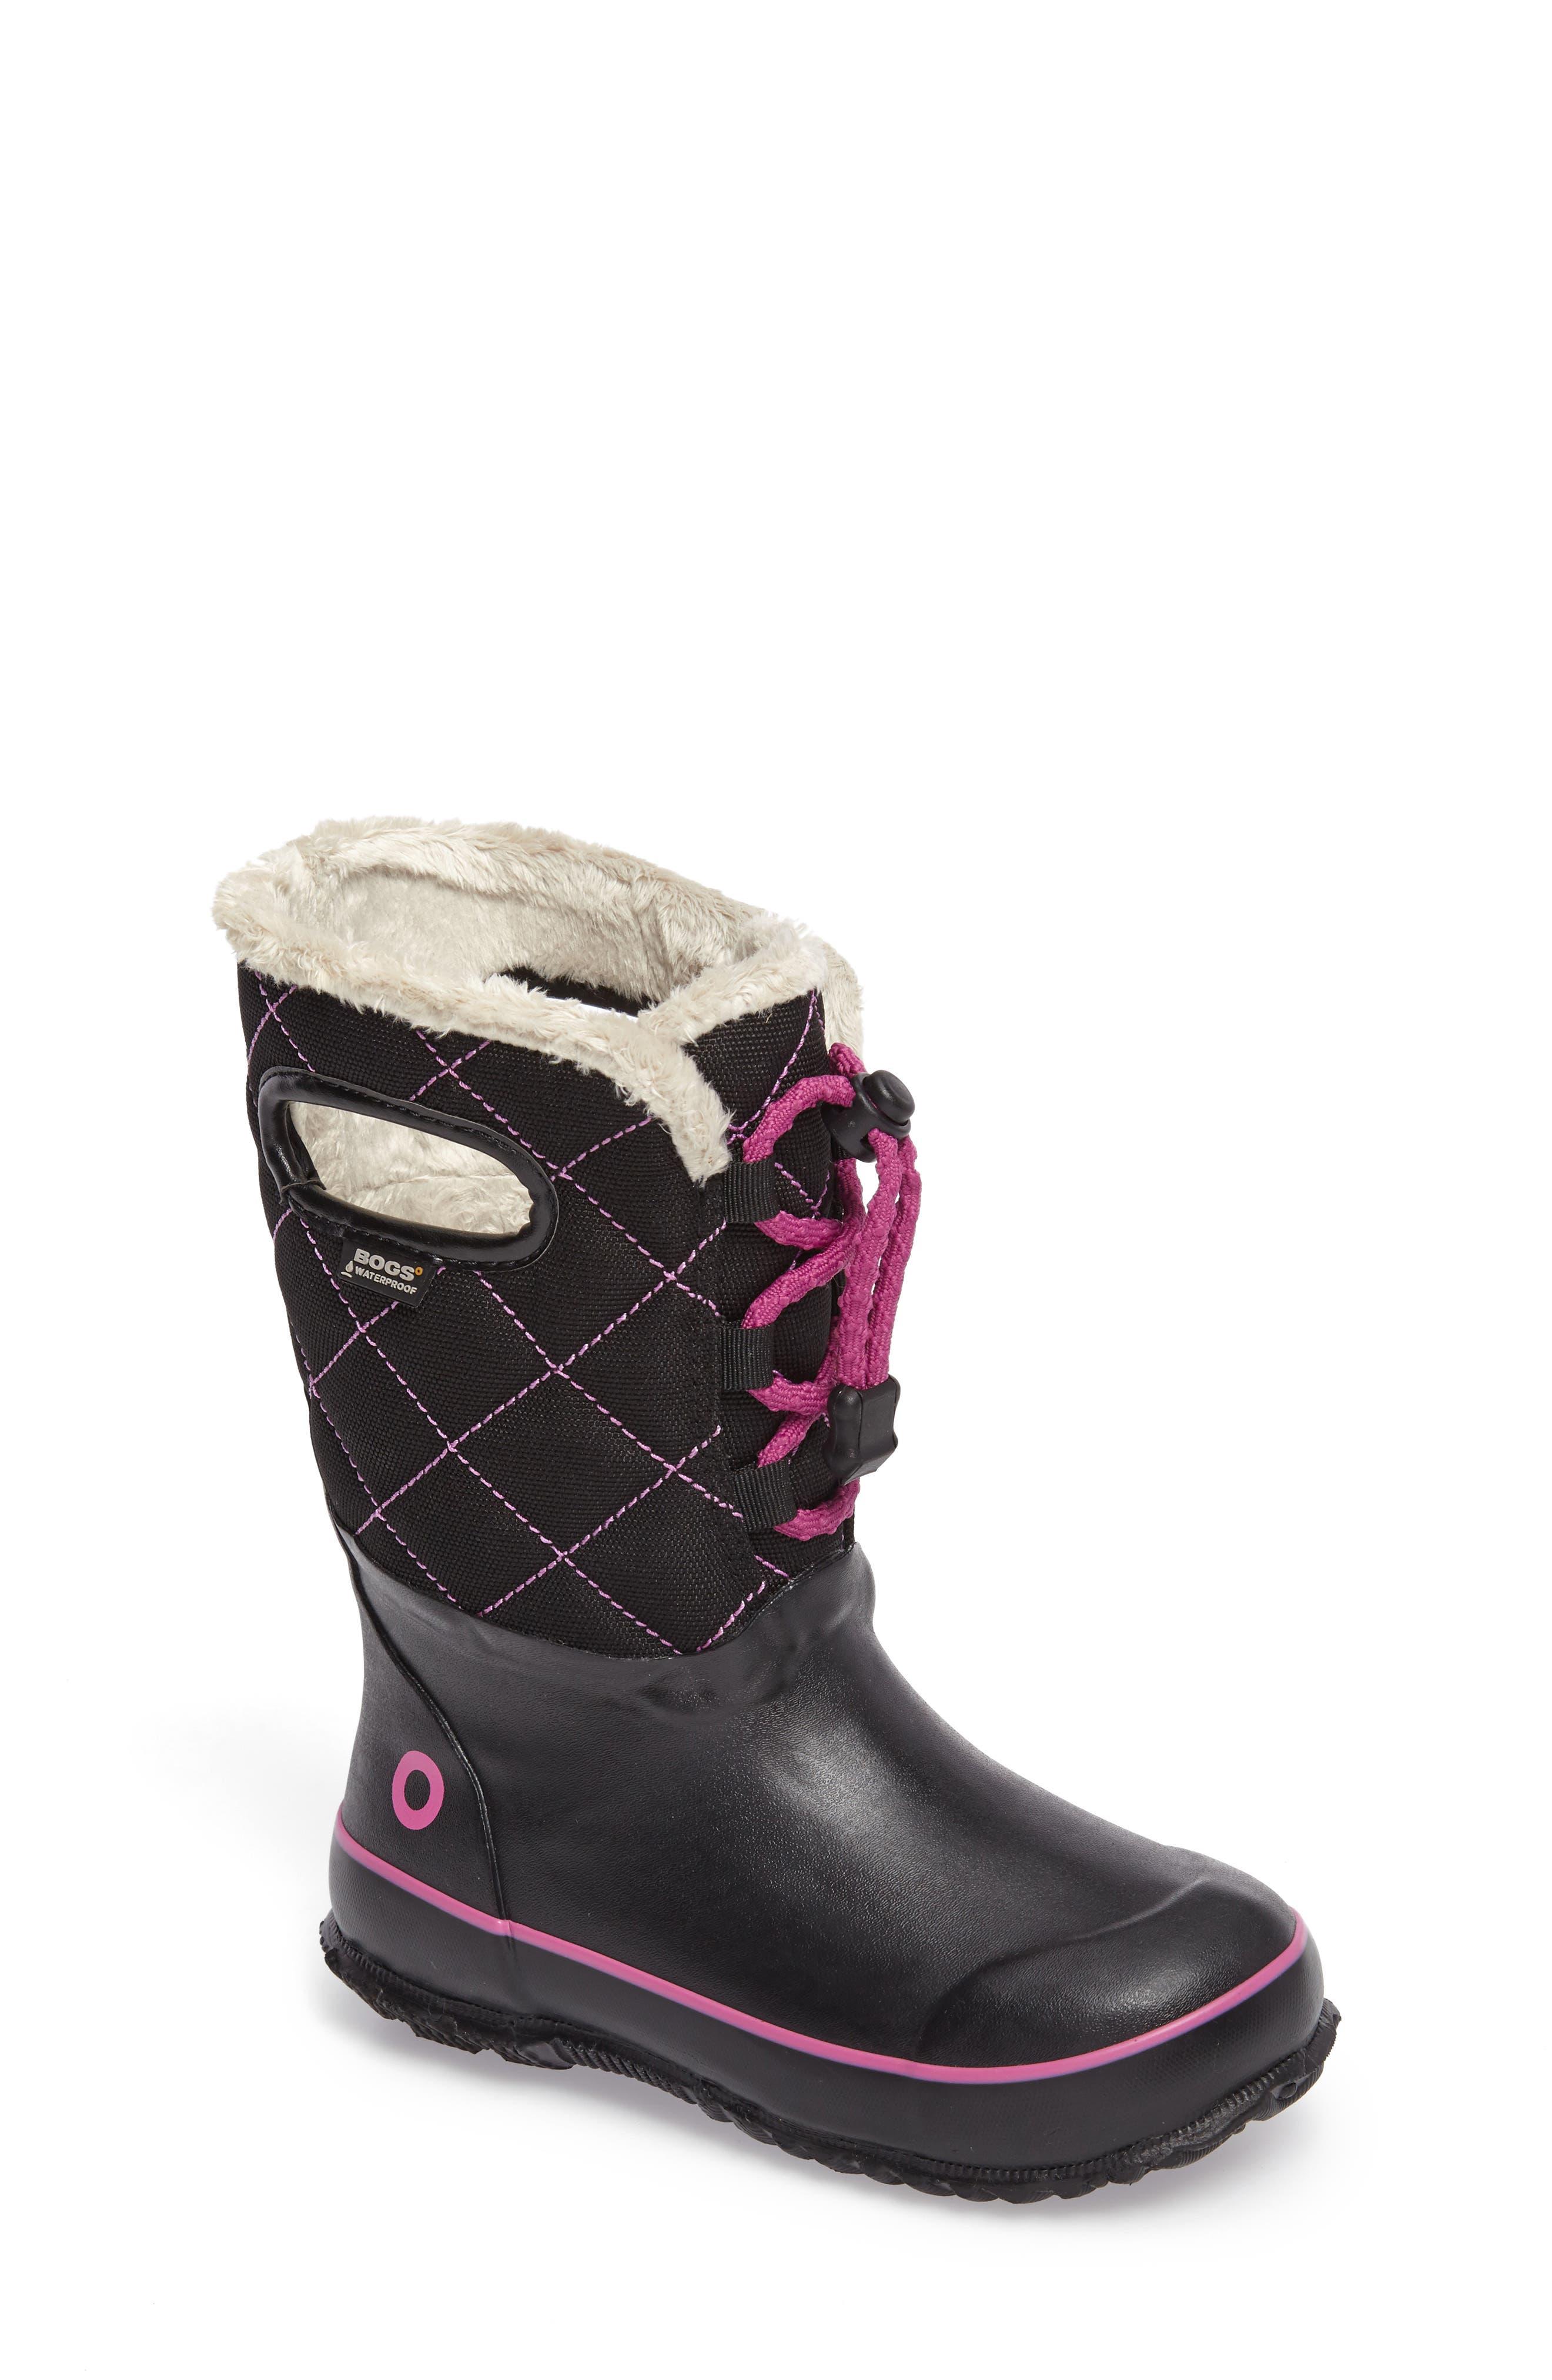 Juno Faux Fur Insulated Waterproof Boot,                             Main thumbnail 1, color,                             Black Multi